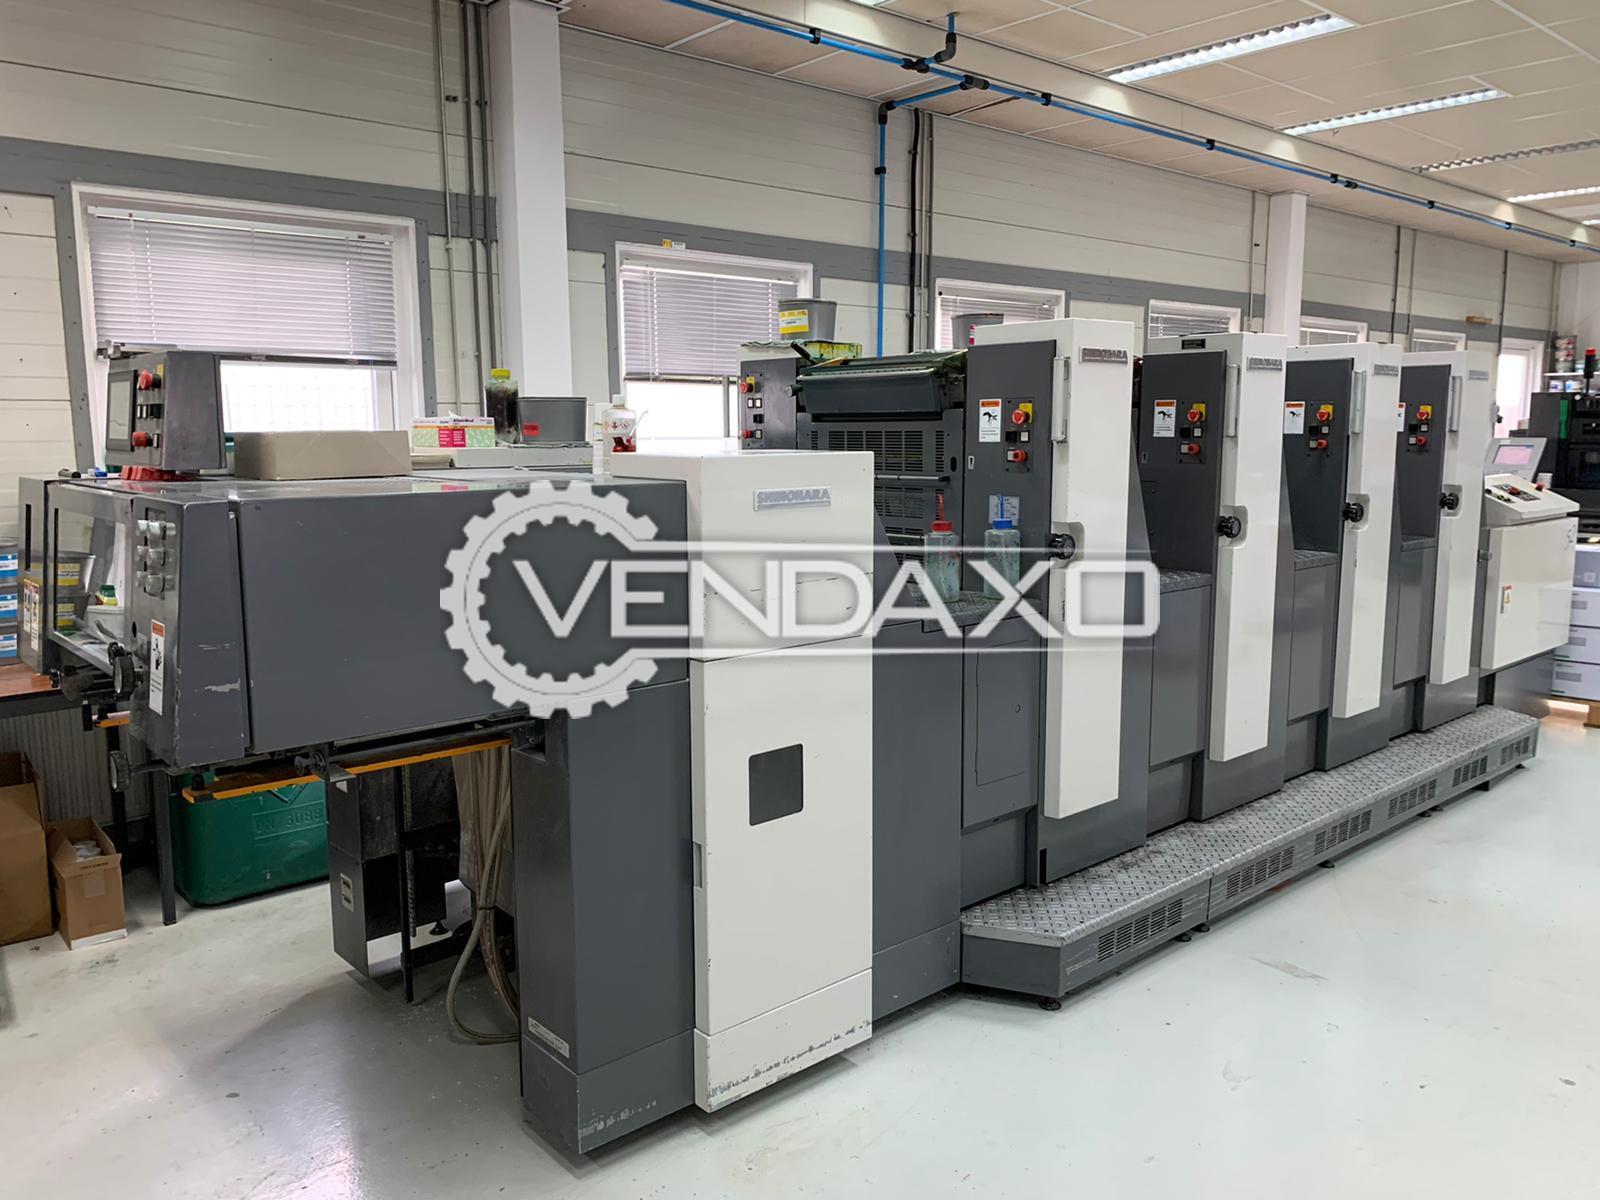 Shinohara 52 IVH Offset Printing Machine - 15 X 20 Inch, 4 Color